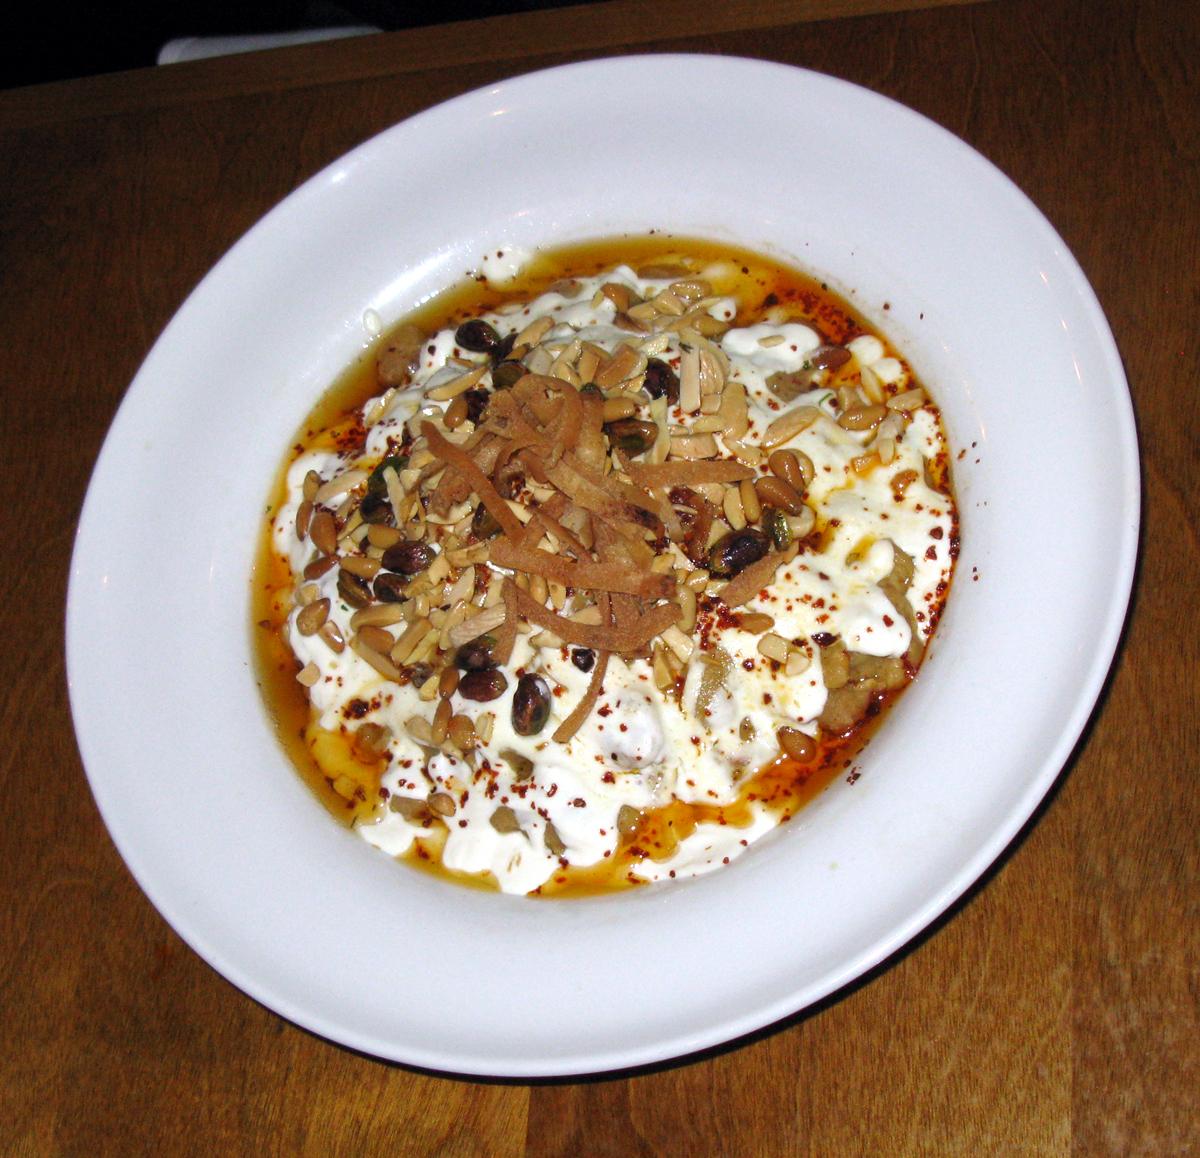 Fatteh hummus (فتة حمص بالطحينه)—chickpeas layered with pine nuts, tahini-yogurt sauce, and toasted pita bread